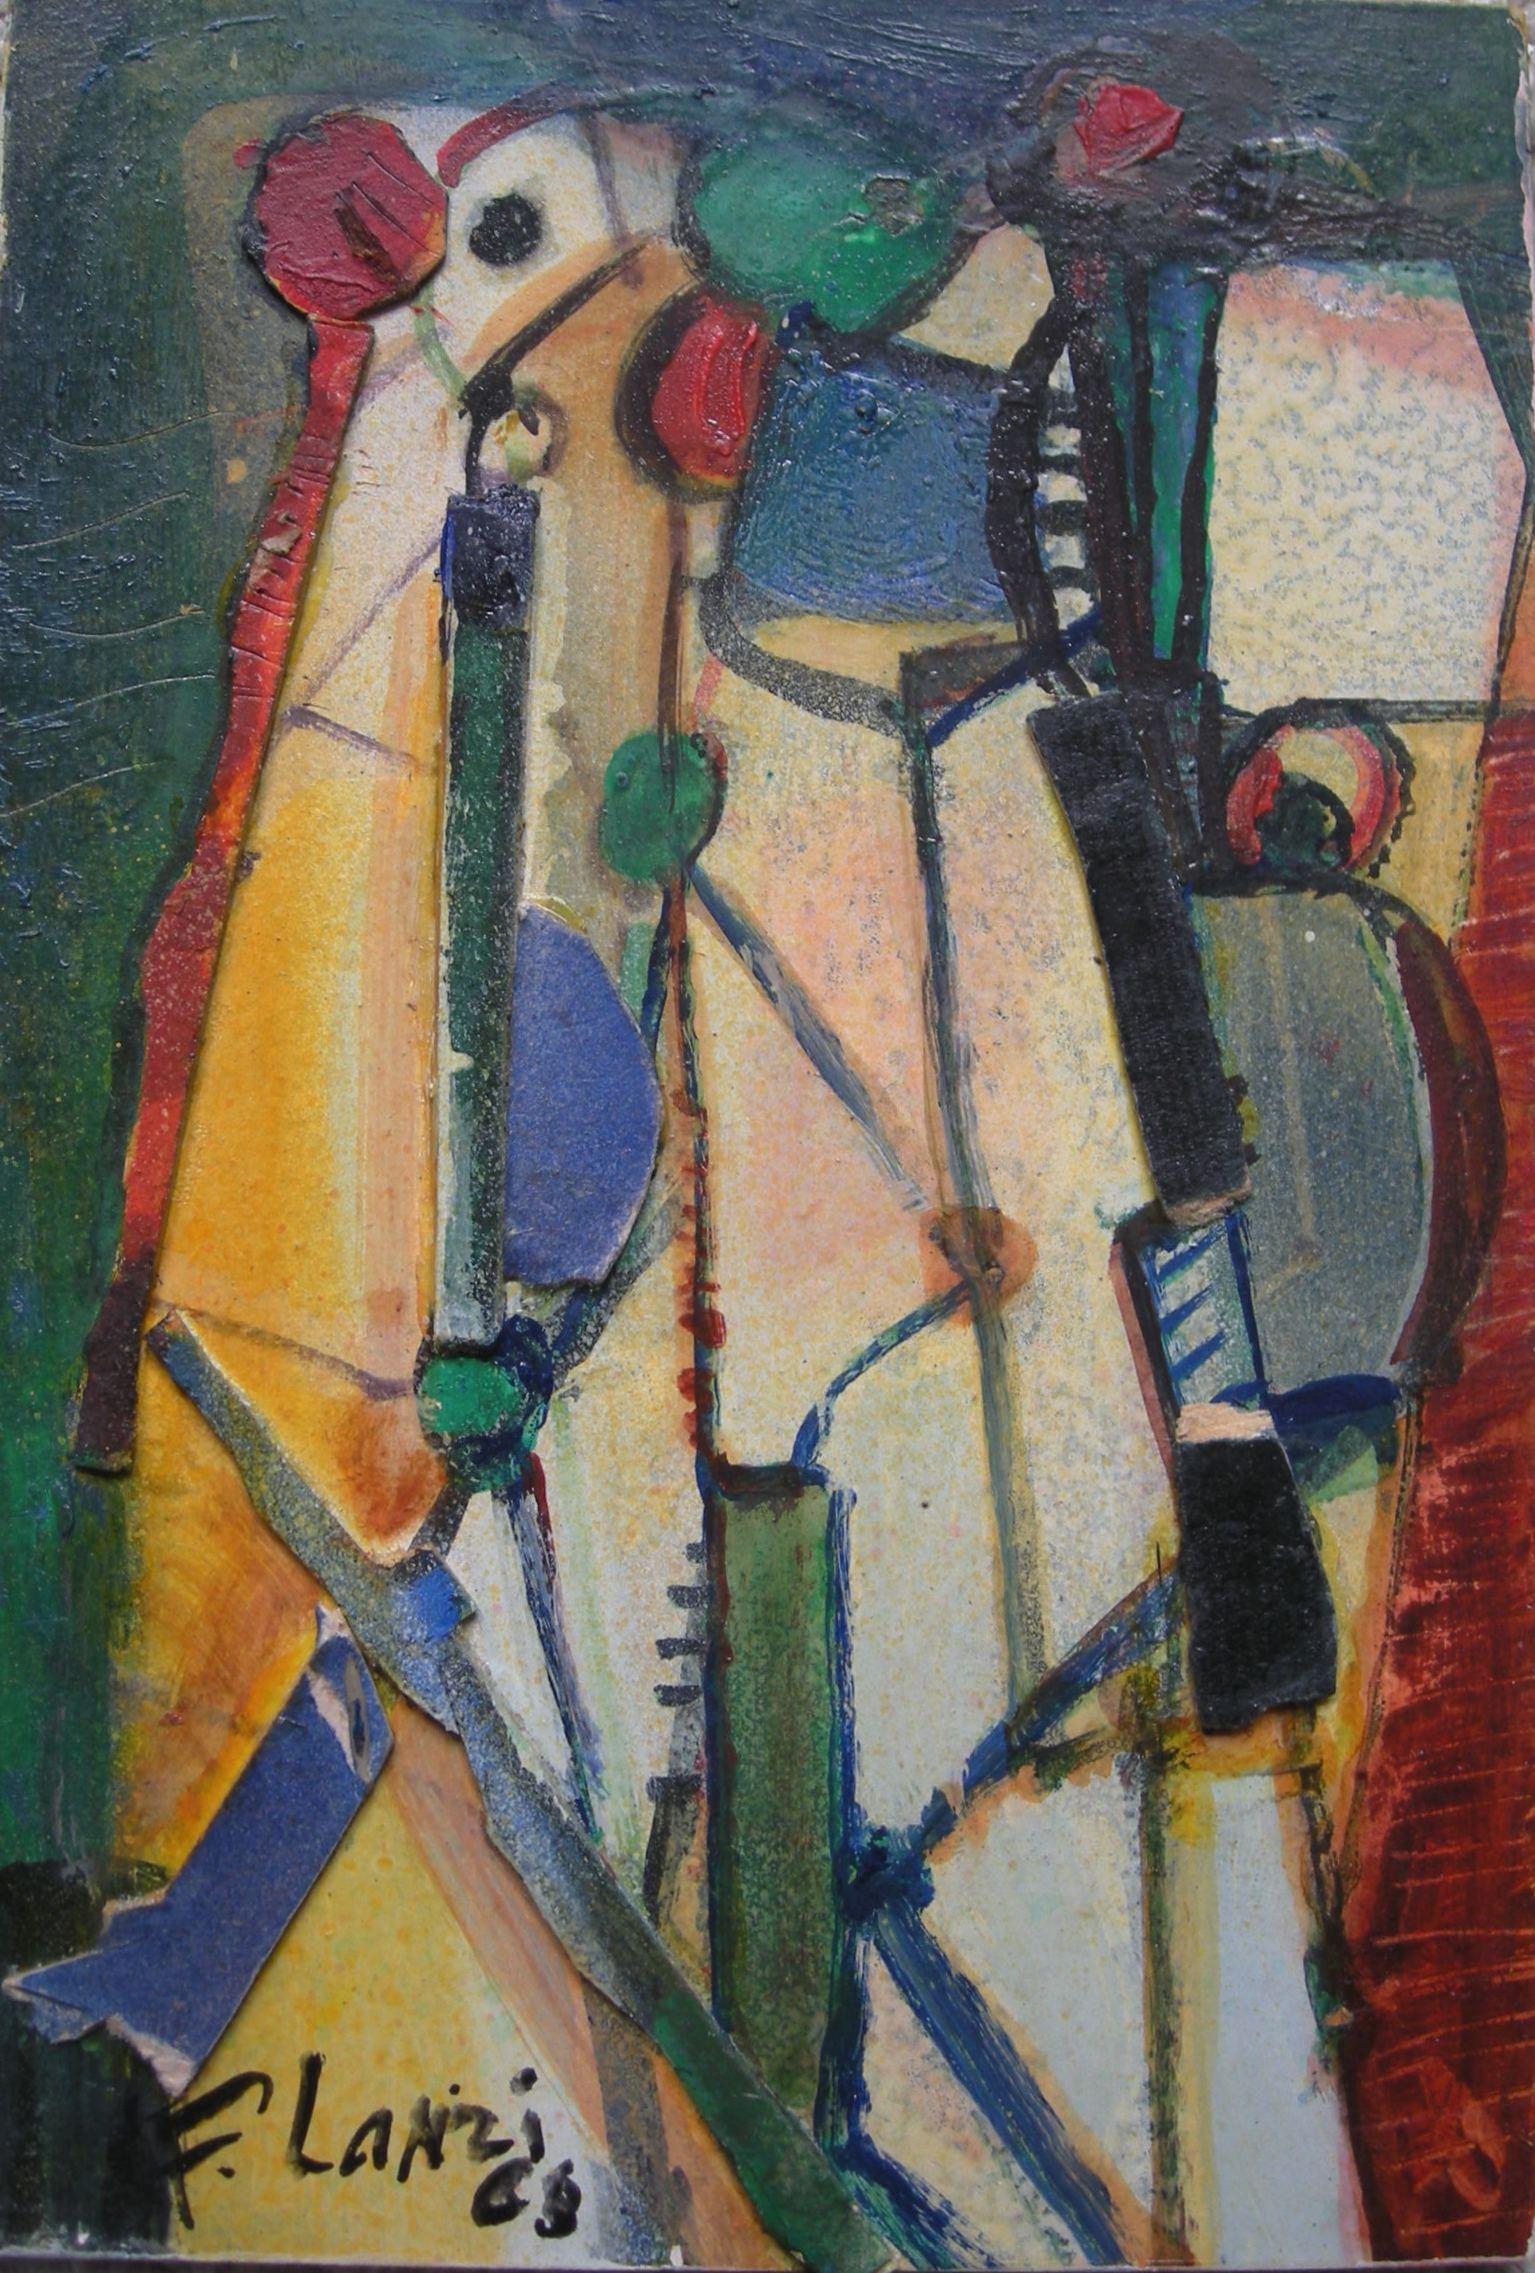 Francois Lanzi - Abstract 1966